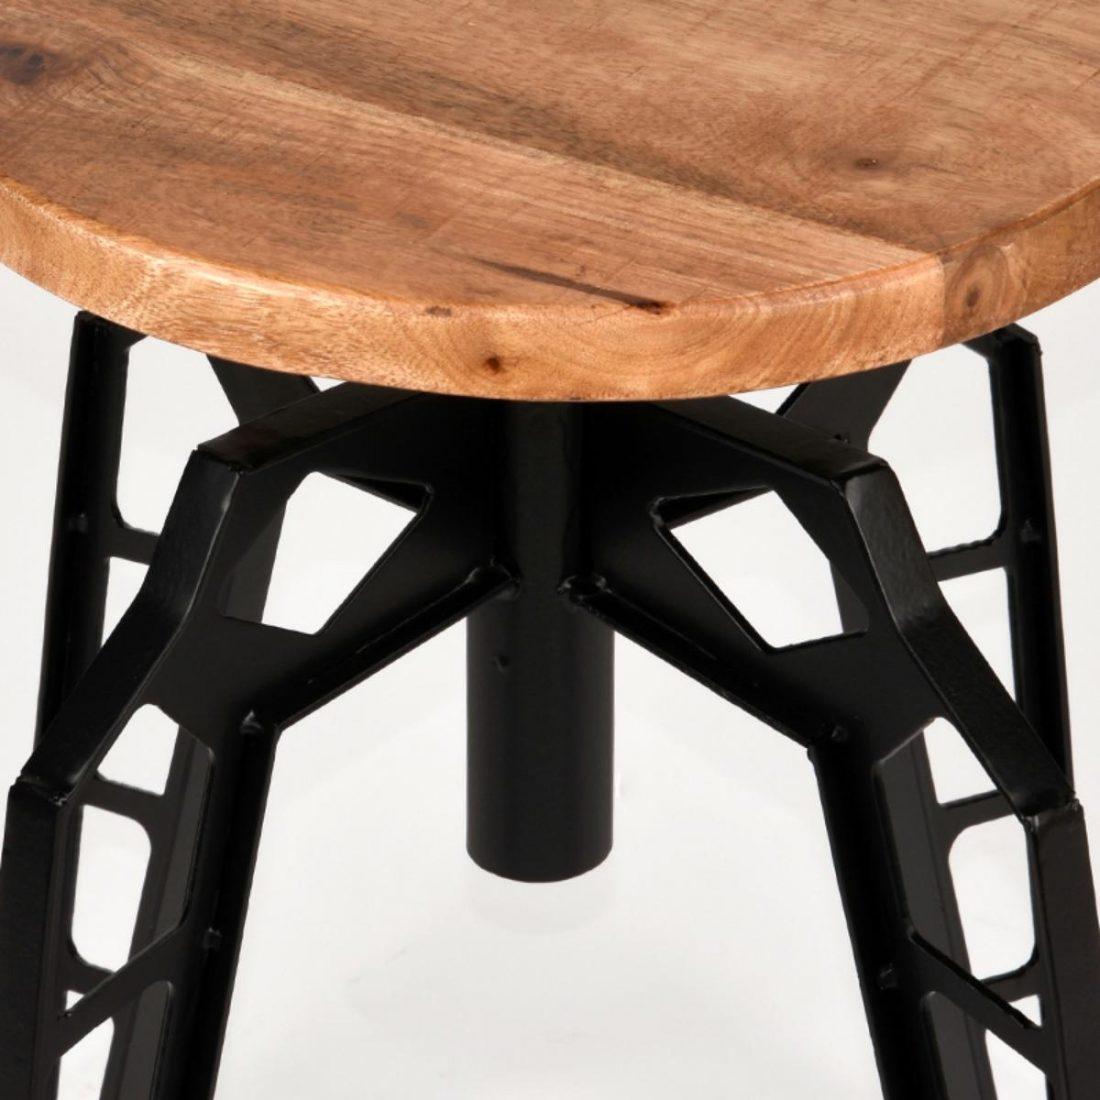 Kruk Pebble Zwart Metaal Rough Mangohout 35x35x52 Cm Detail 2